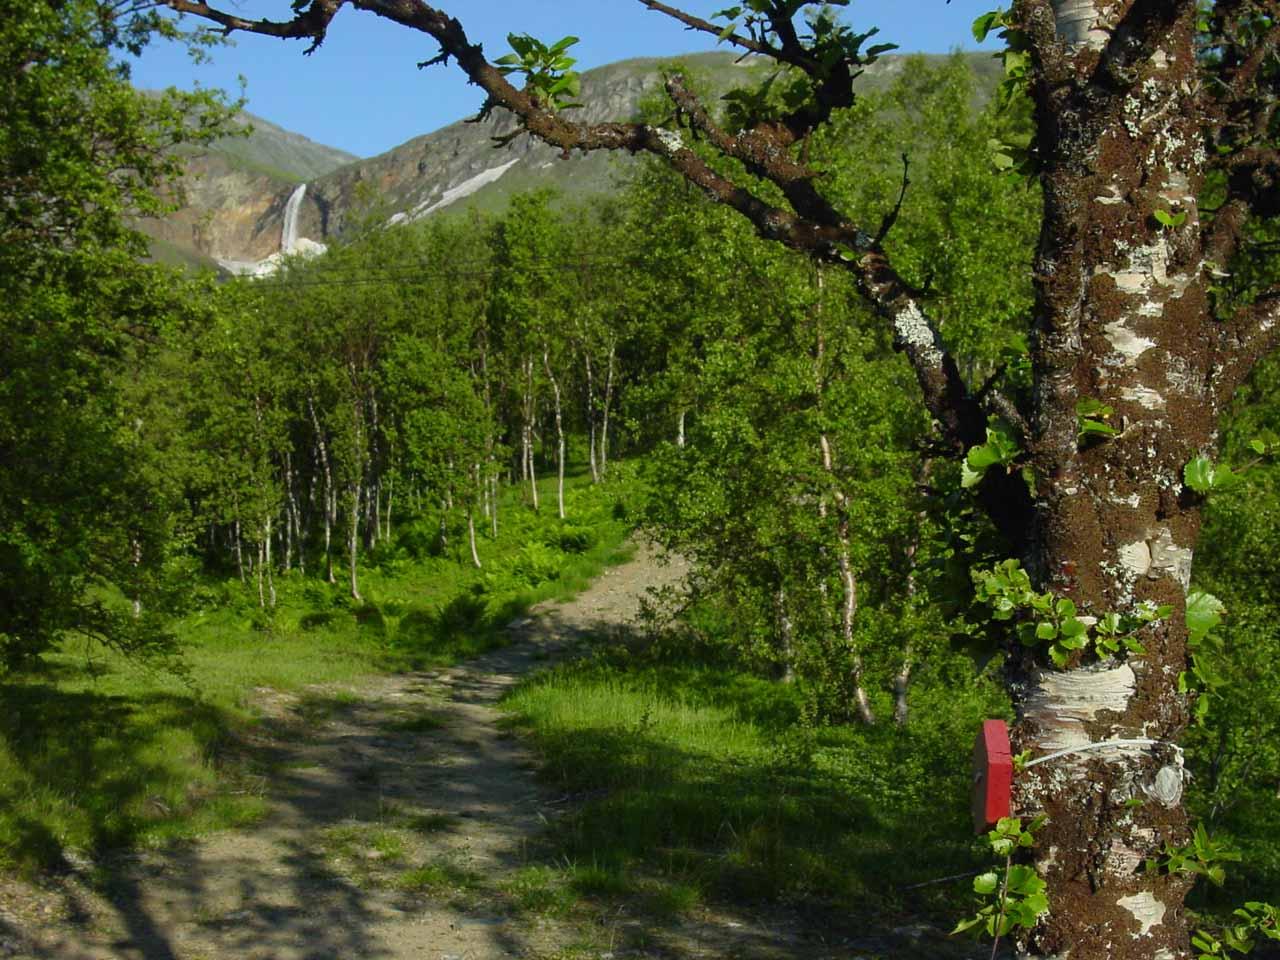 Red marker guiding me towards Fosselvfossen